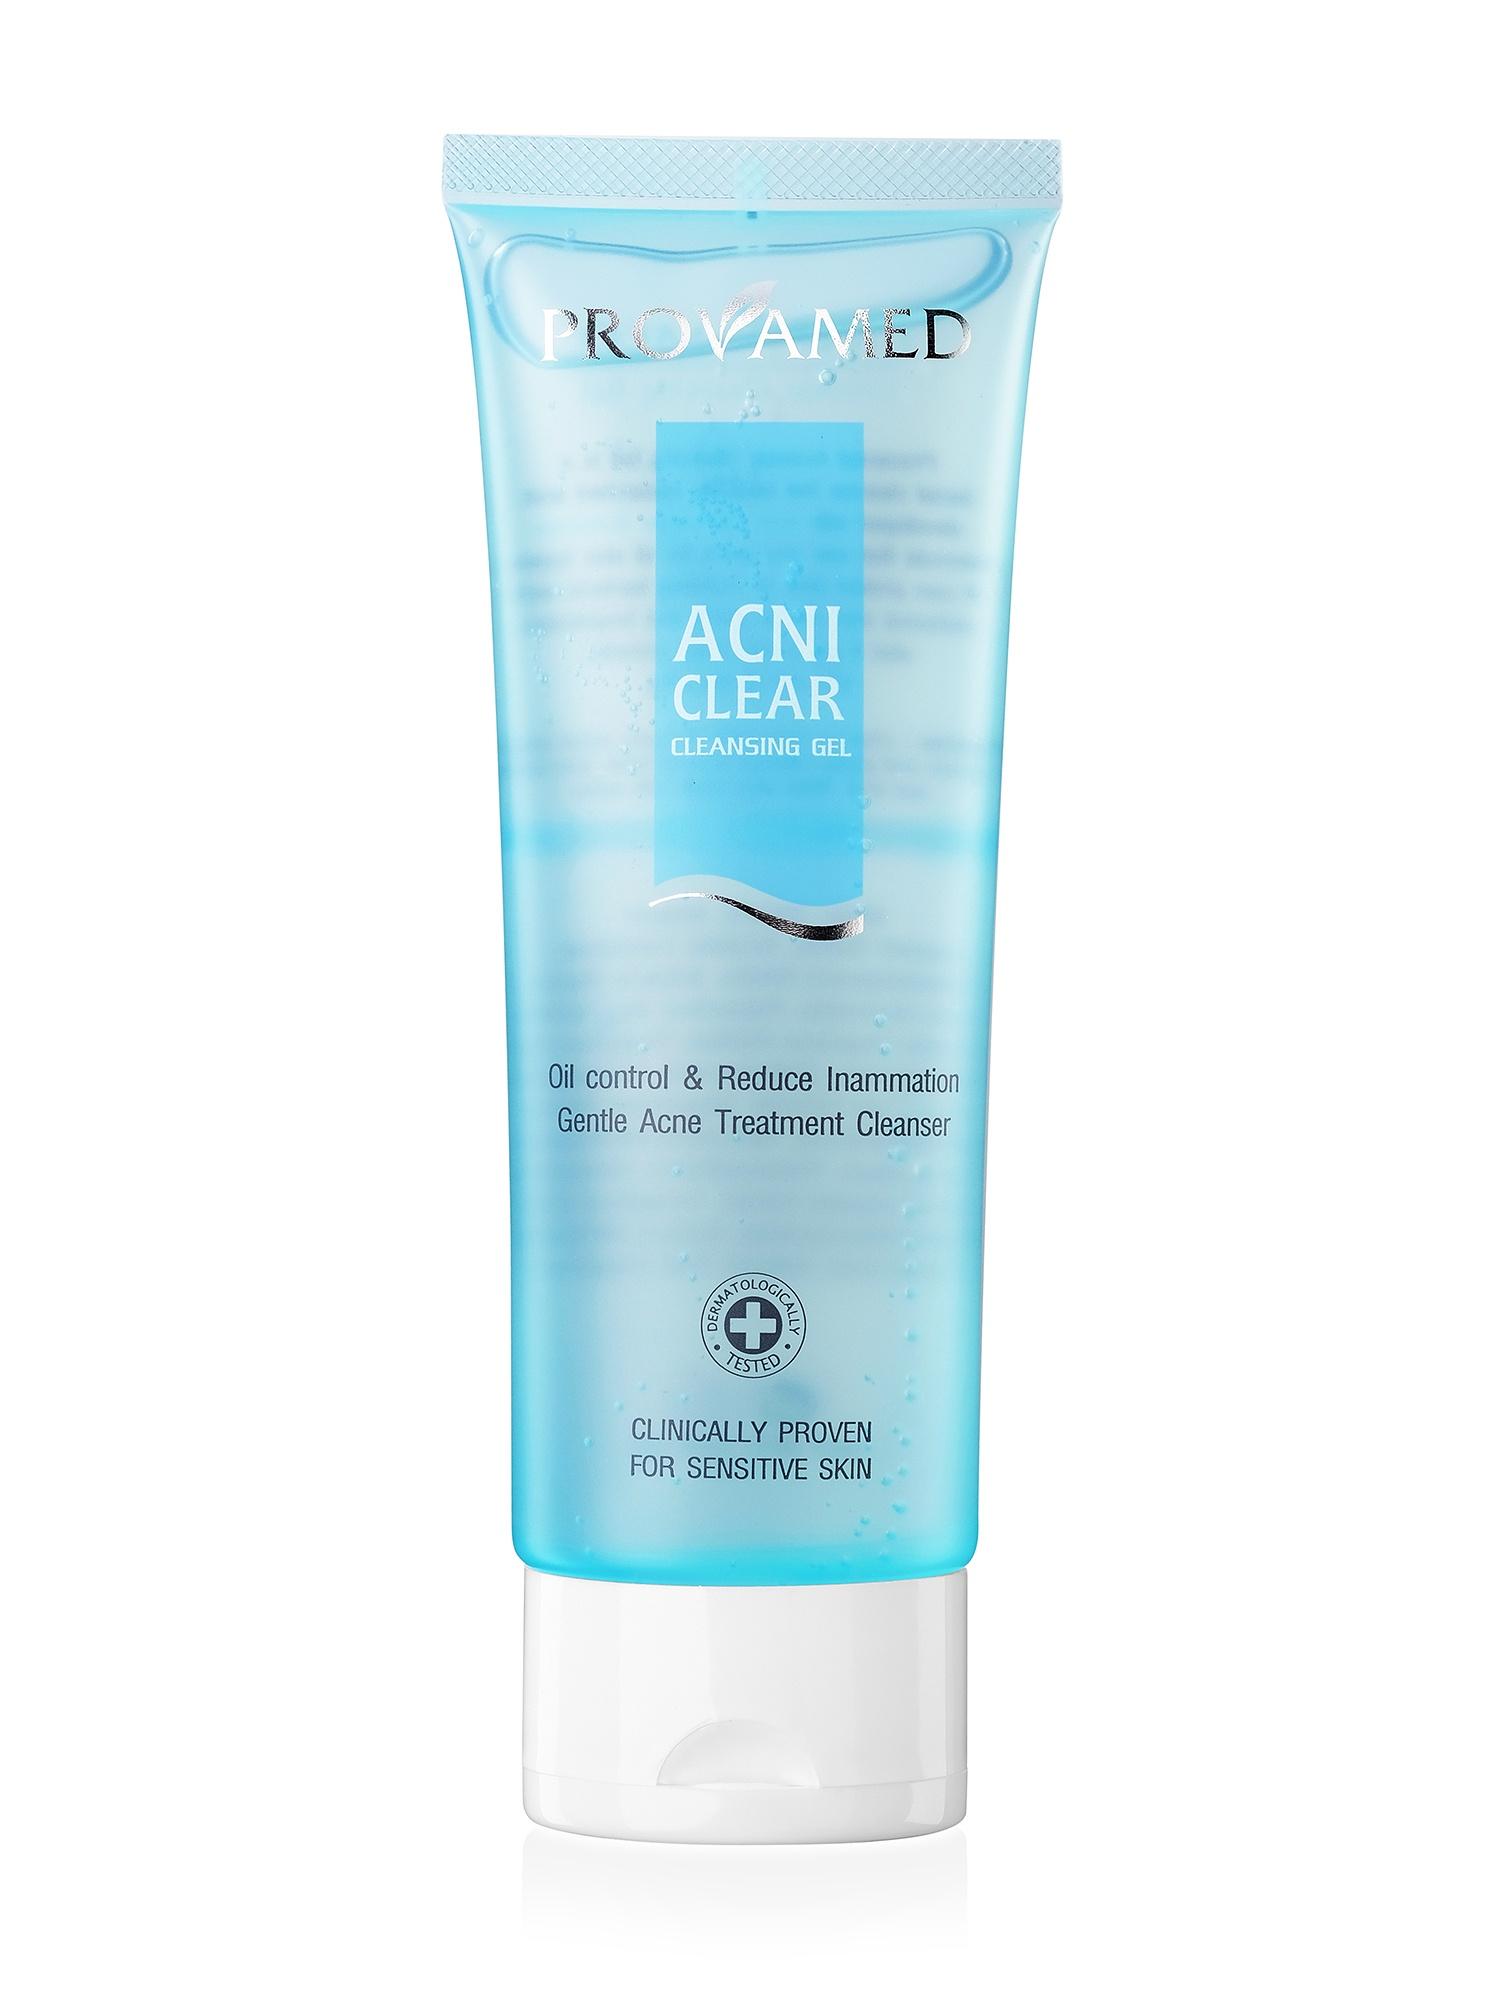 Очищающий гель для проблемной кожи Provamed AcniClear Cleansing Gel, 120 мл Provamed